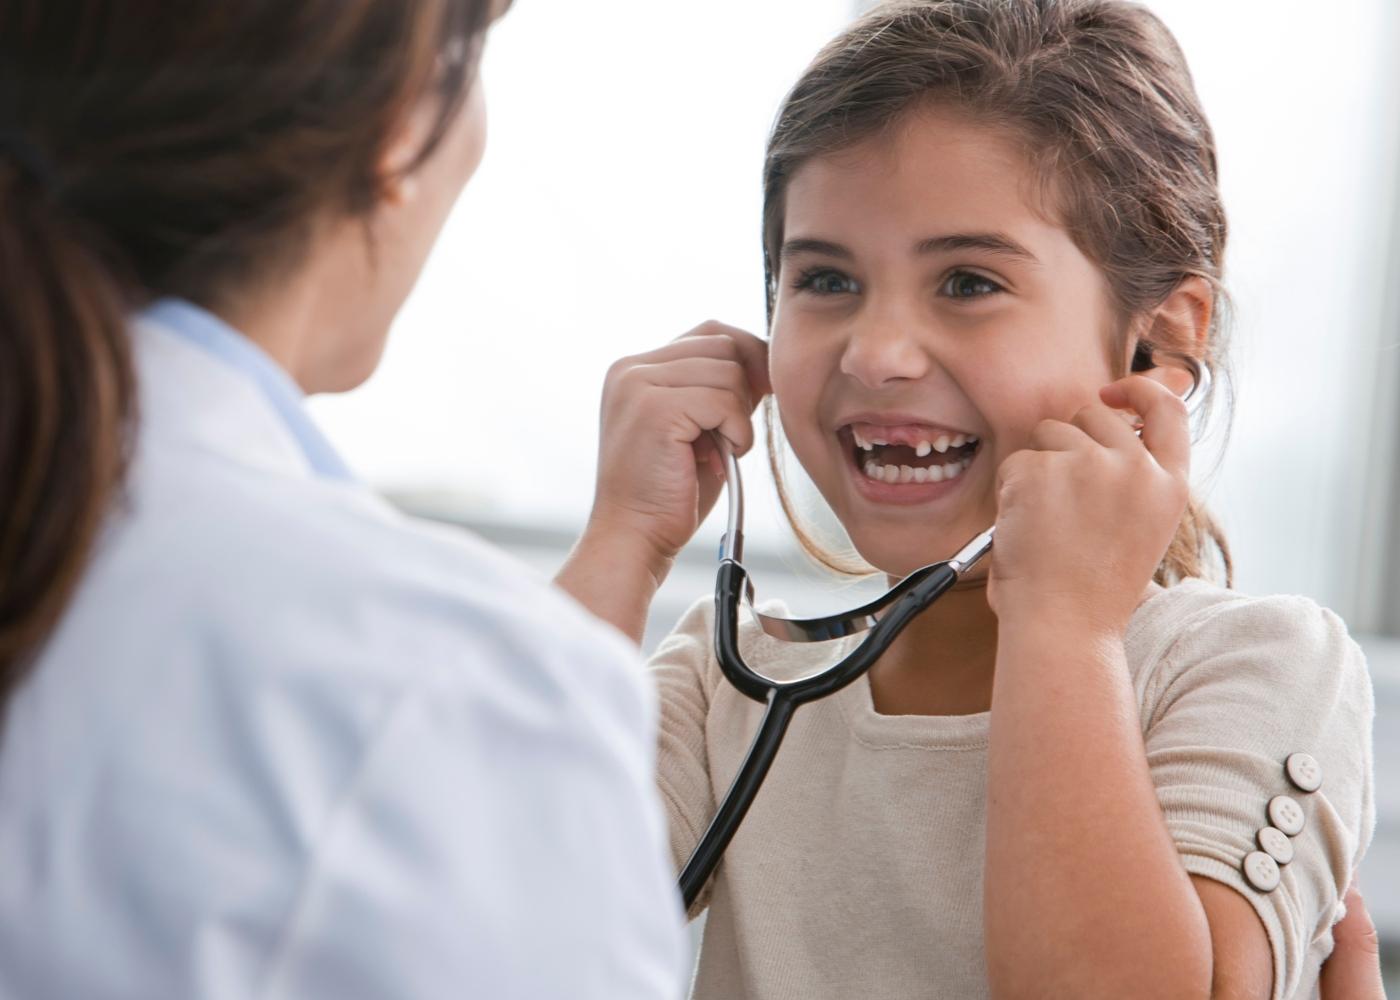 Menina numa consulta médica